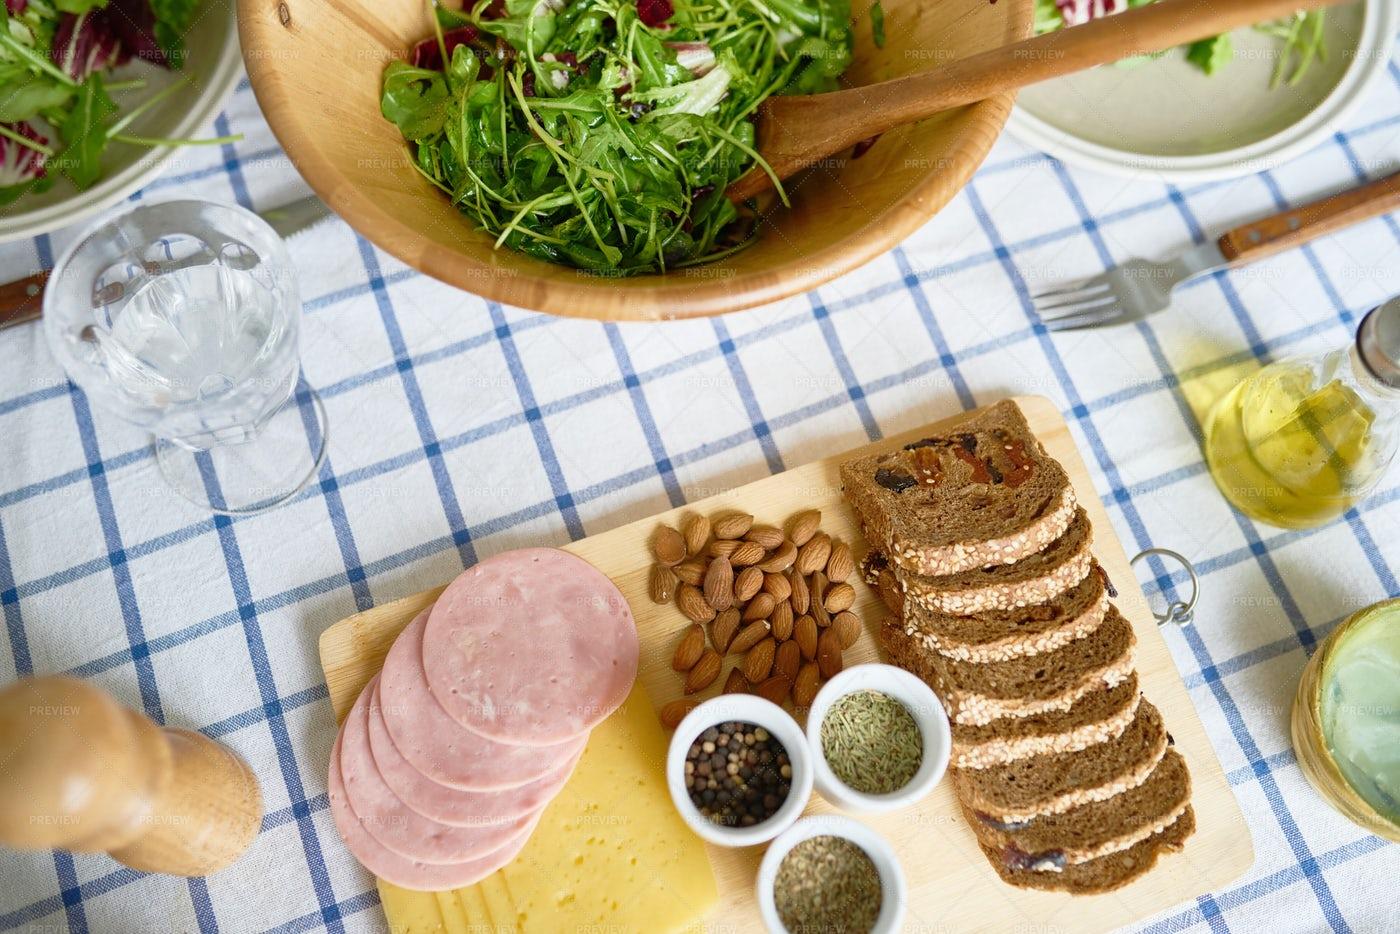 Rustic Homemade Breakfast: Stock Photos